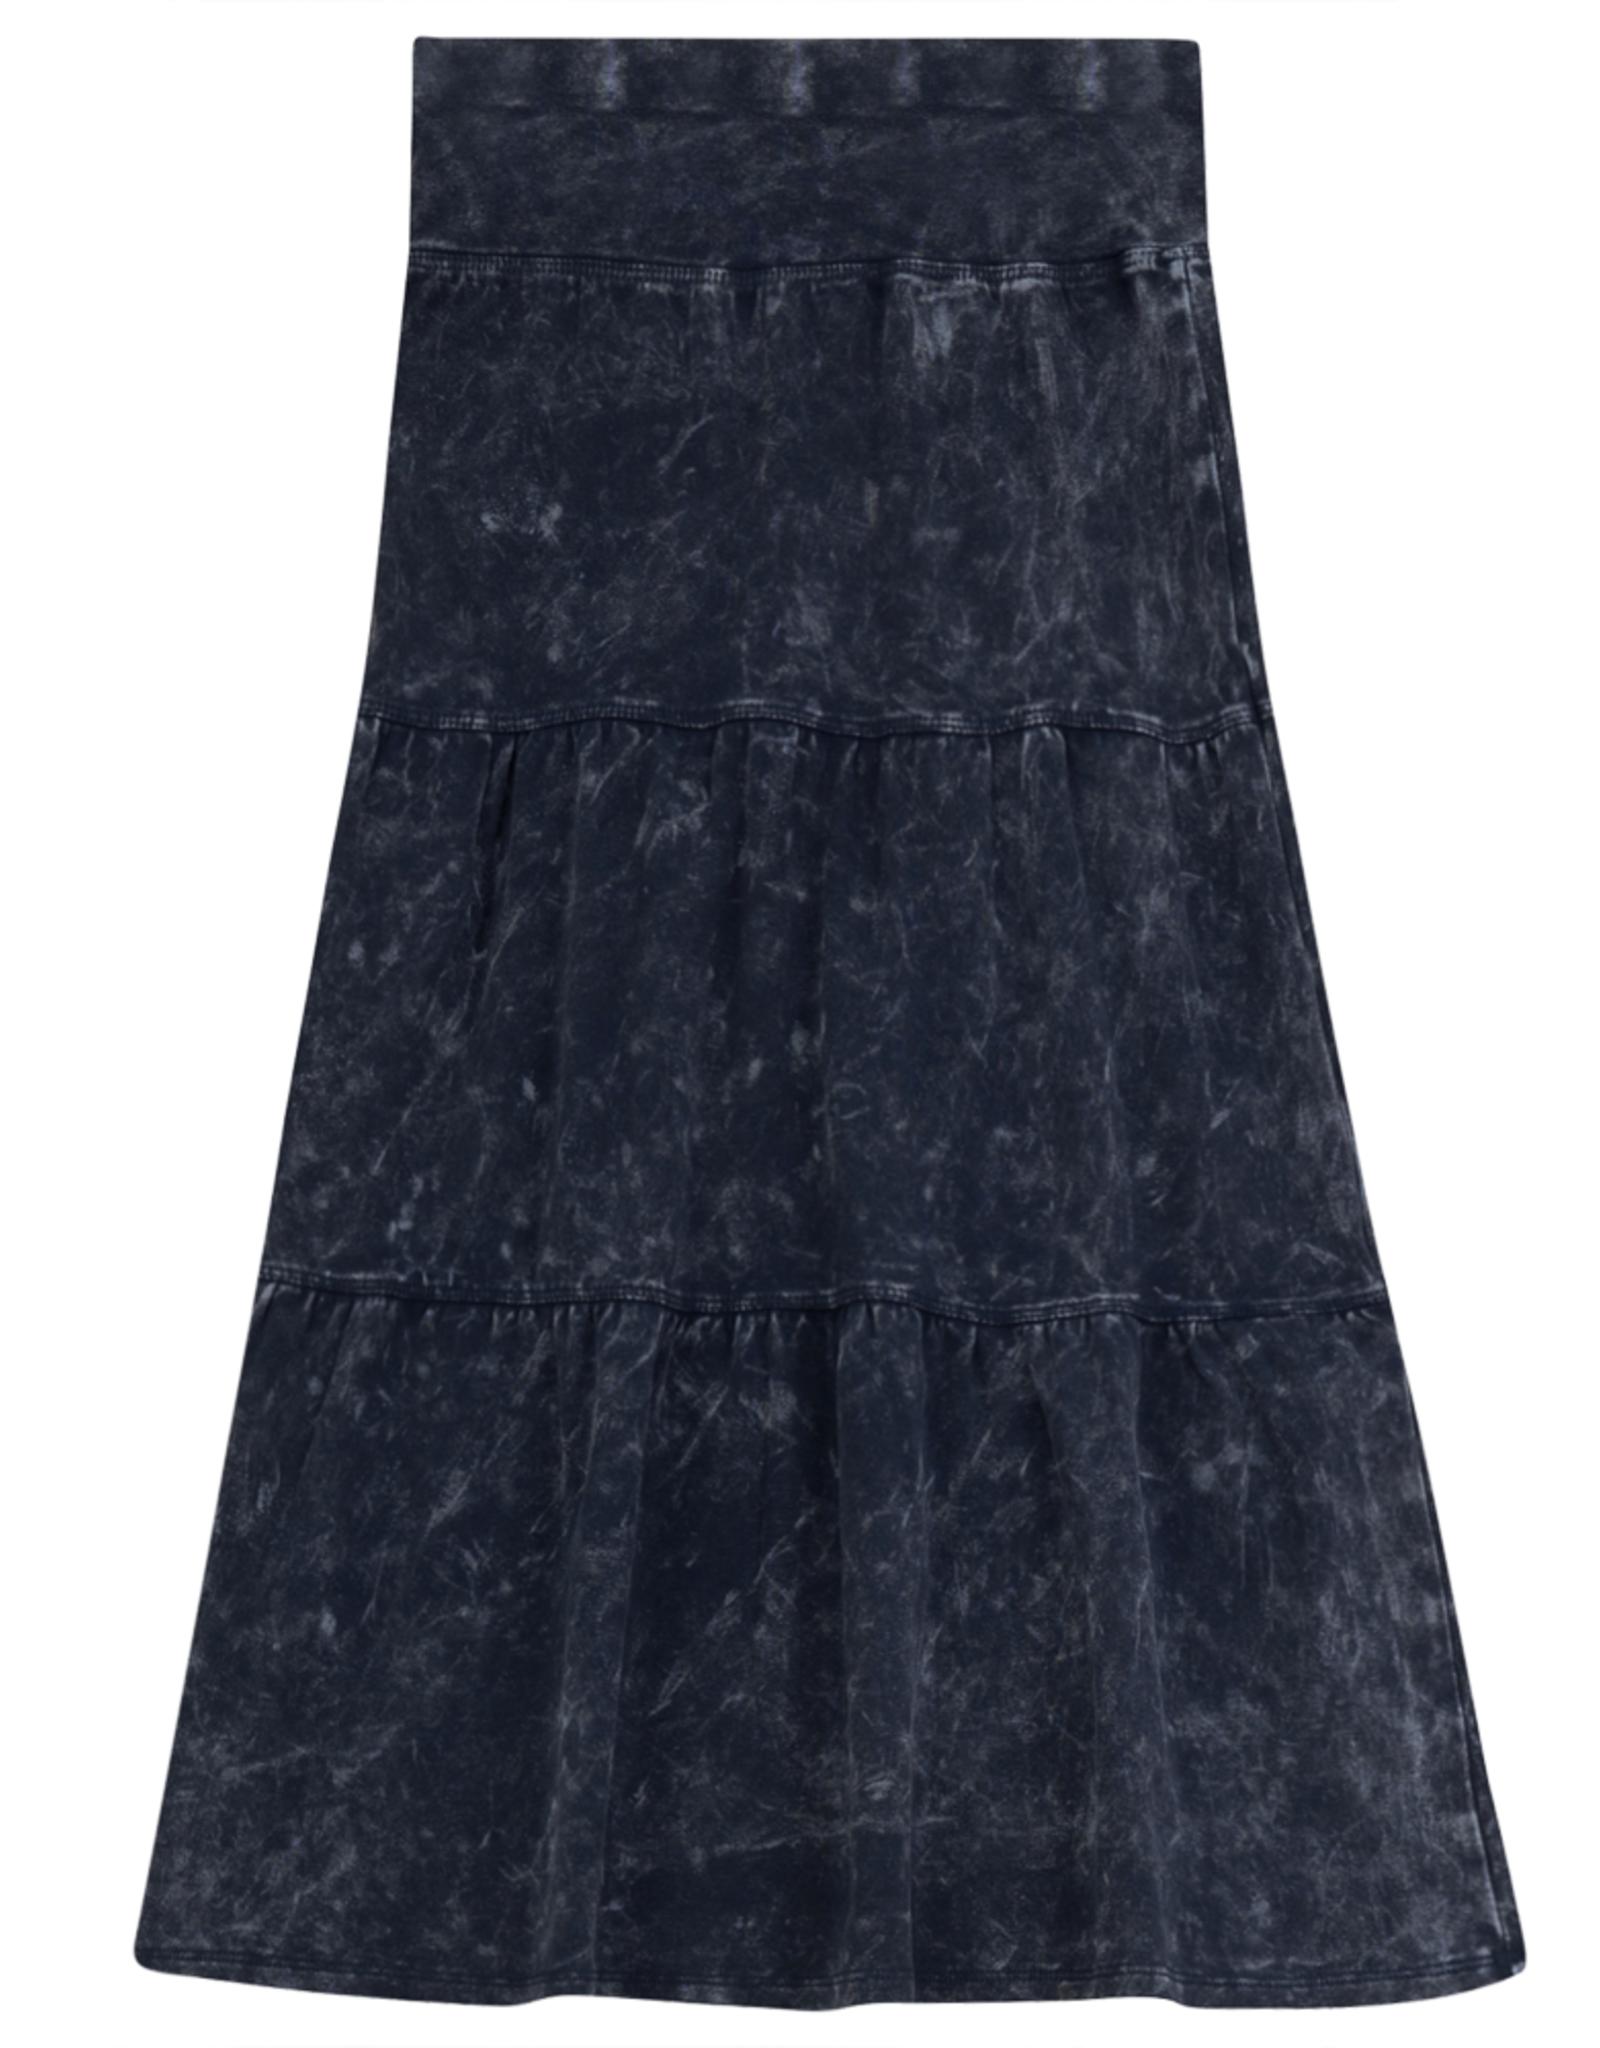 FIVE STAR Five Star Long Tiered Aline Denim Wash Skirt